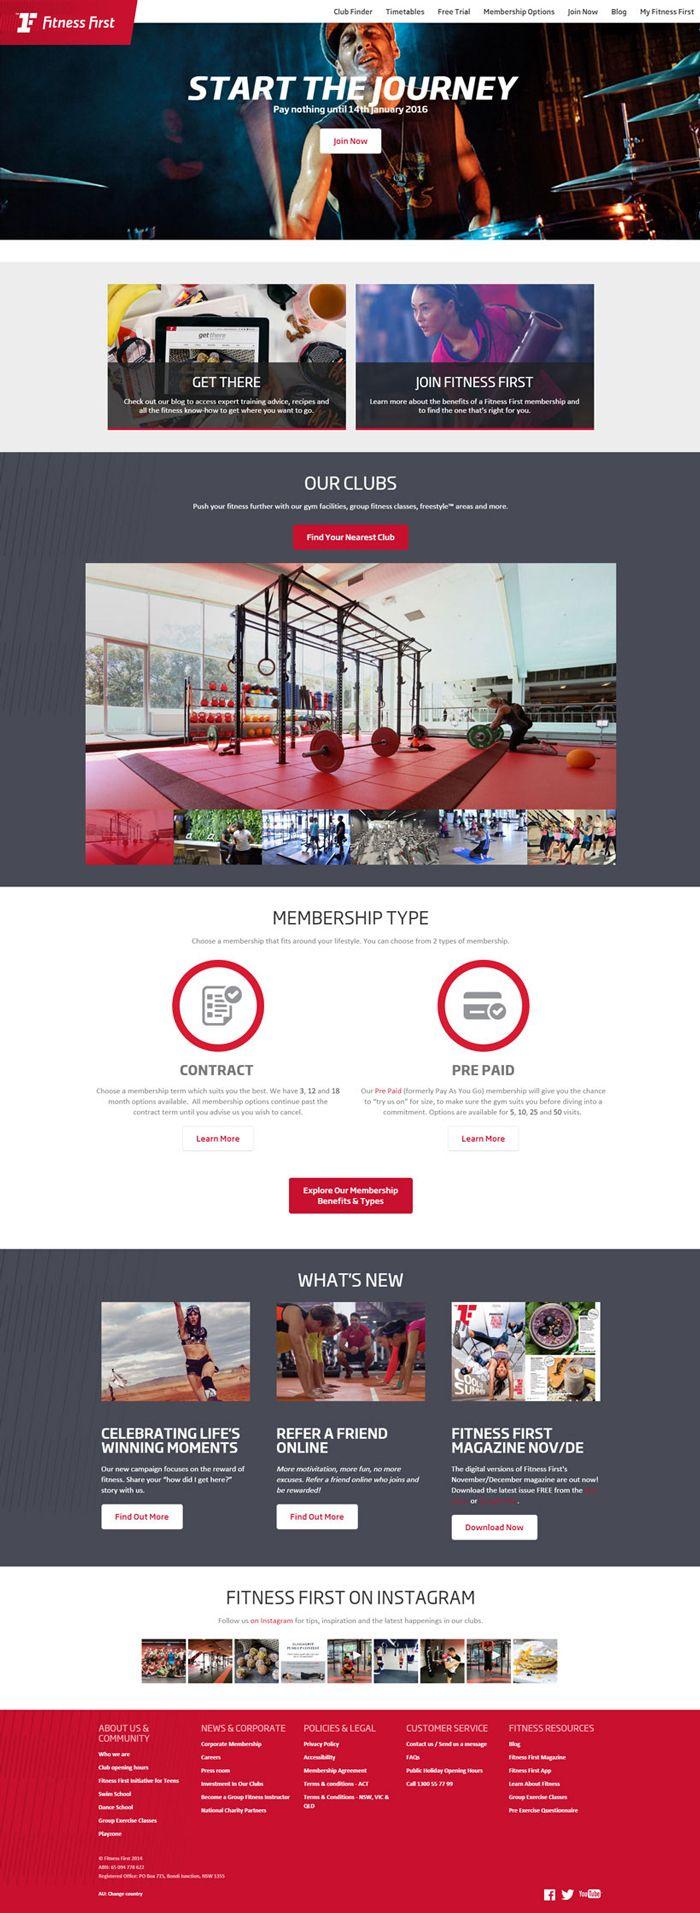 Get Similar Web Design Service Http Smallstereo Com Web Design Services Fun Workouts Website Design Inspiration